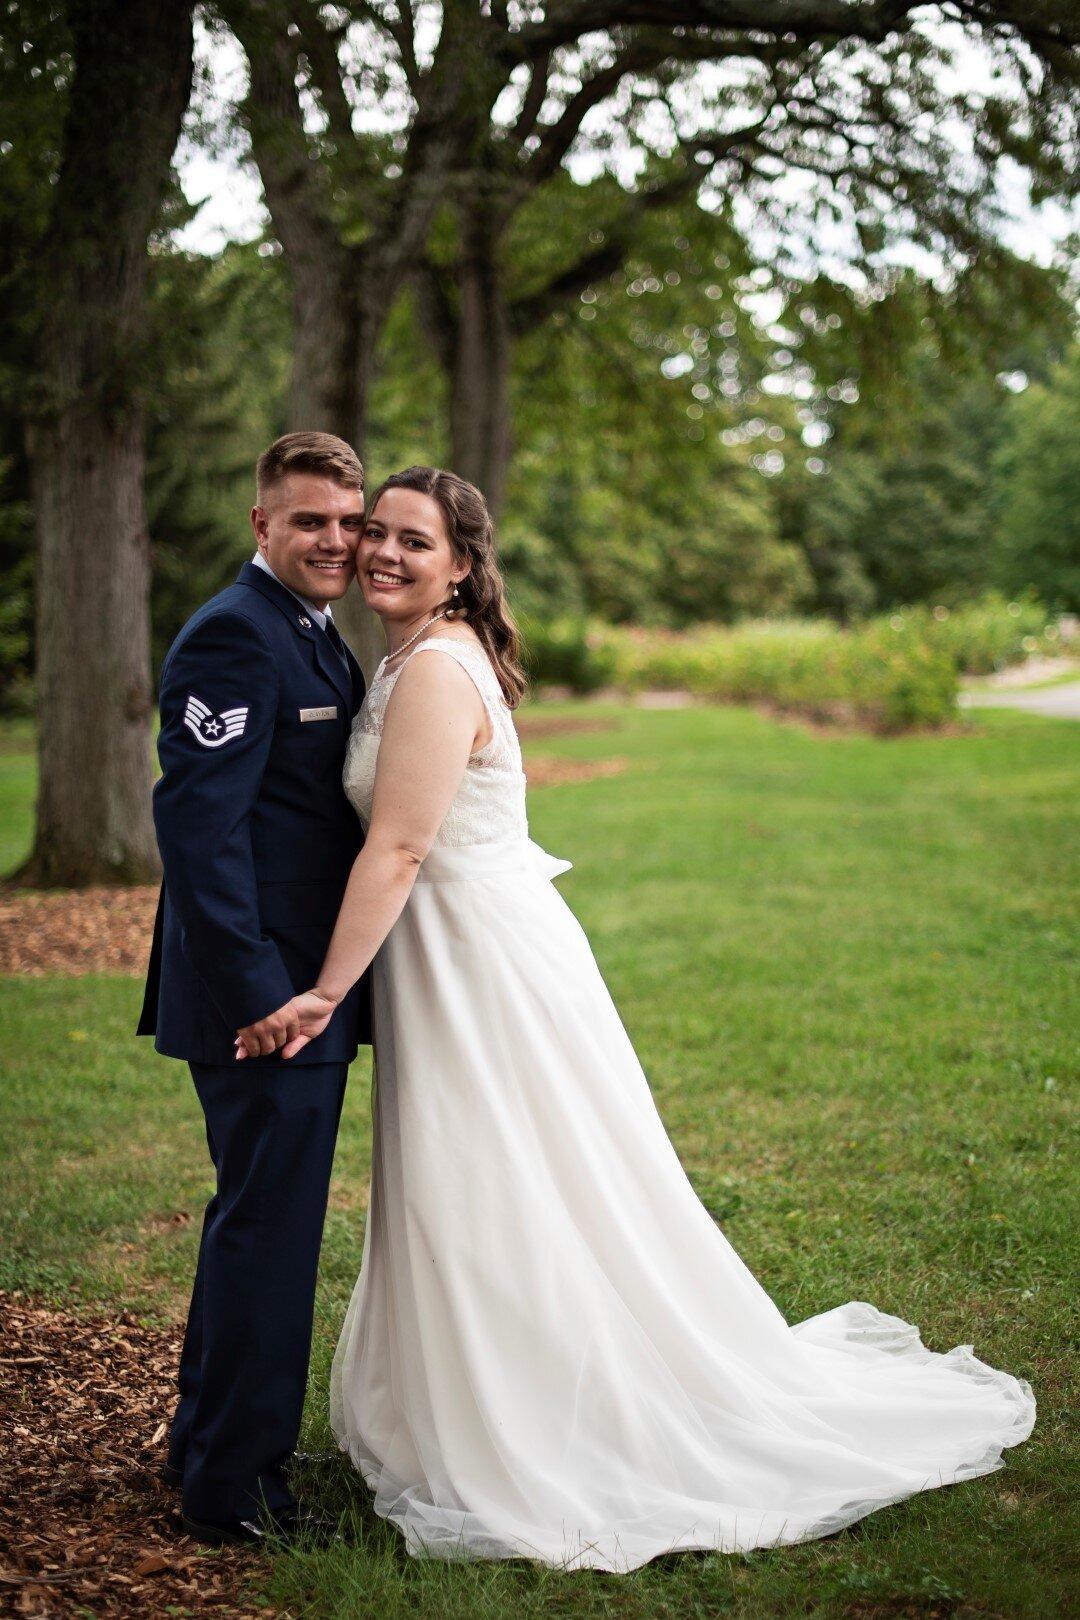 Courtney+Brendon_2019_Wedding_58CS1_2713.jpg